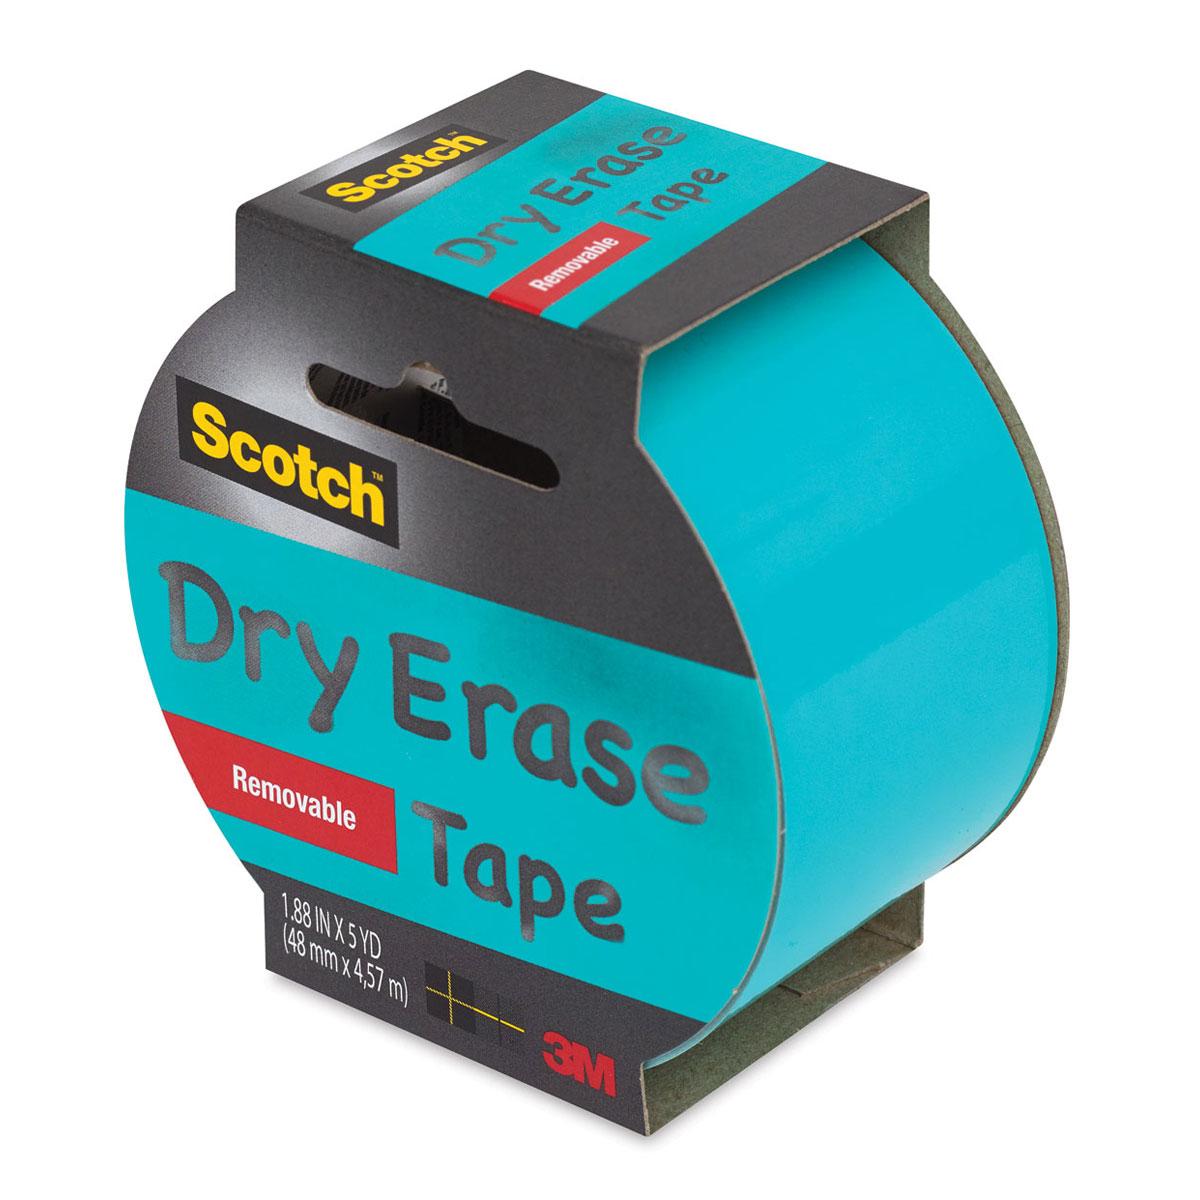 3M Scotch Dry Erase Tape